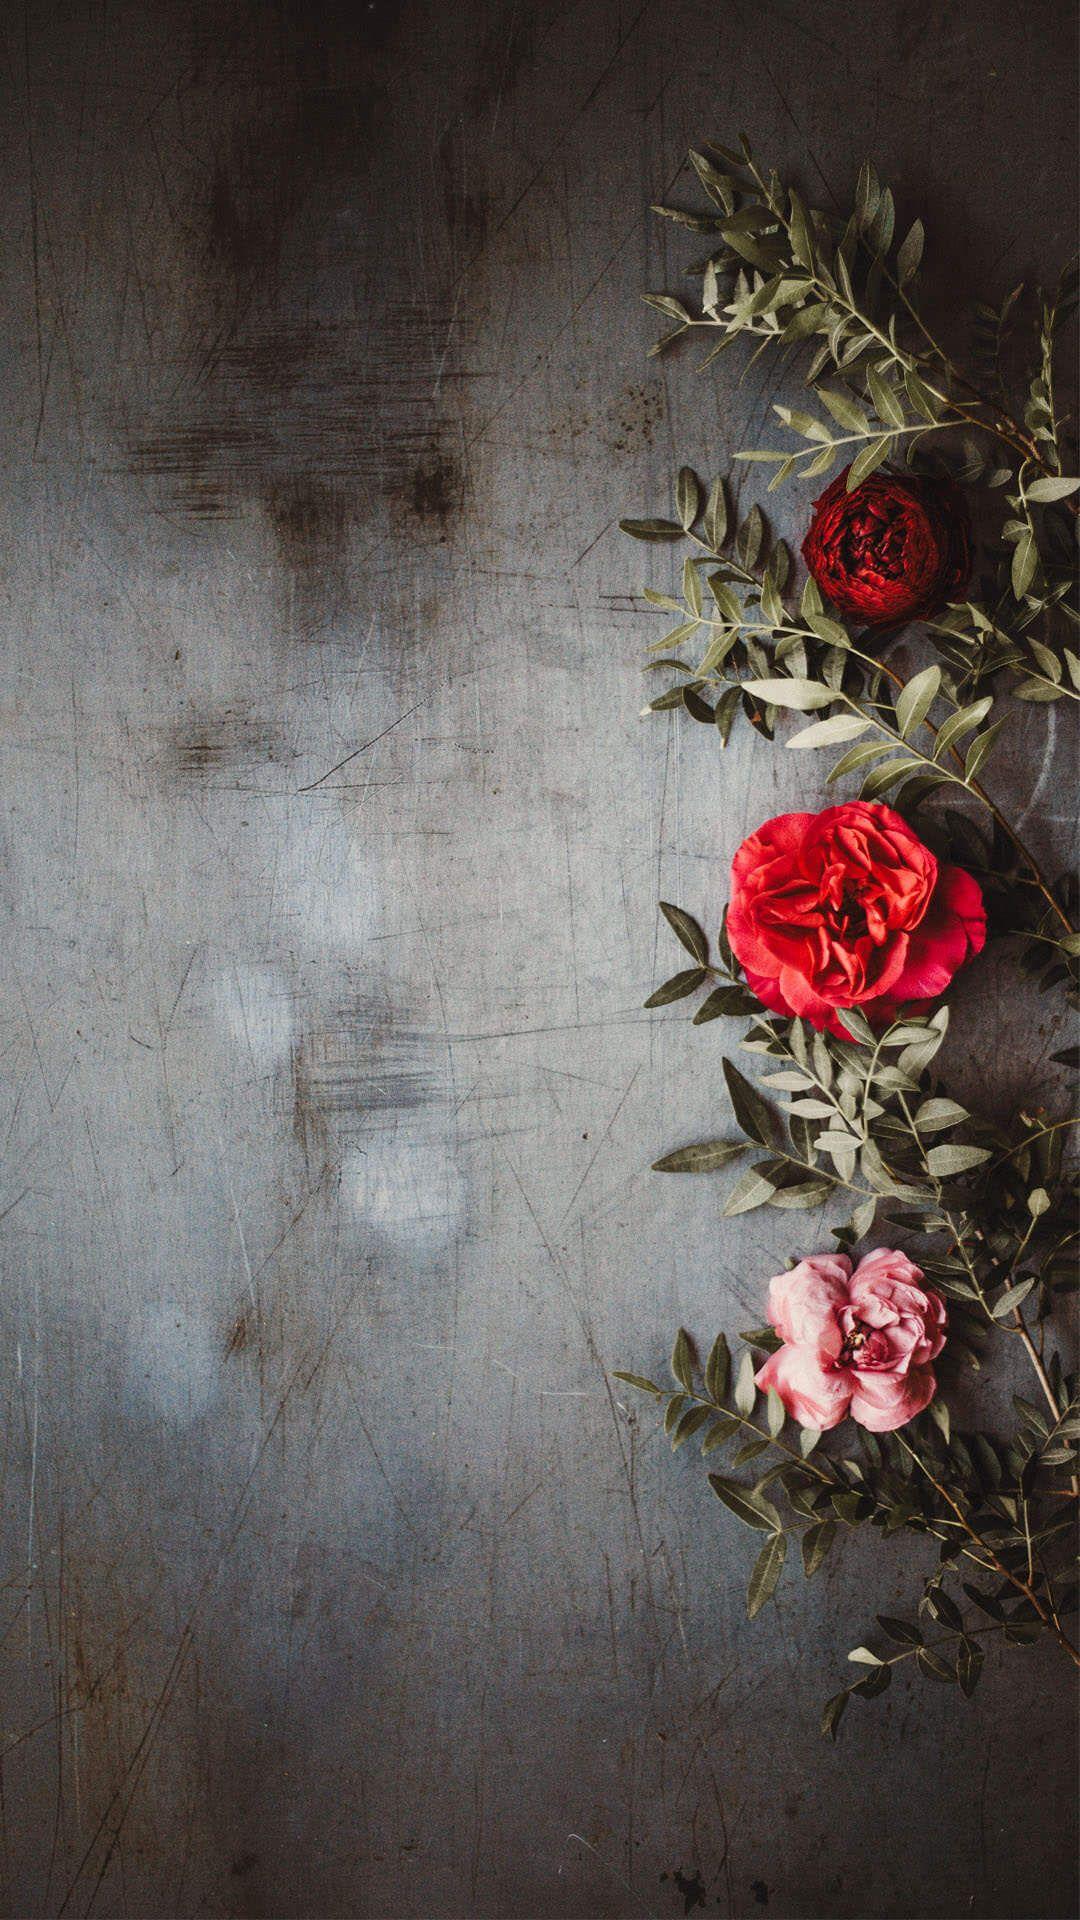 Beautiful Flower Wallpaper For Iphone Flower Iphone Wallpaper Flower Phone Wallpaper Flower Aesthetic